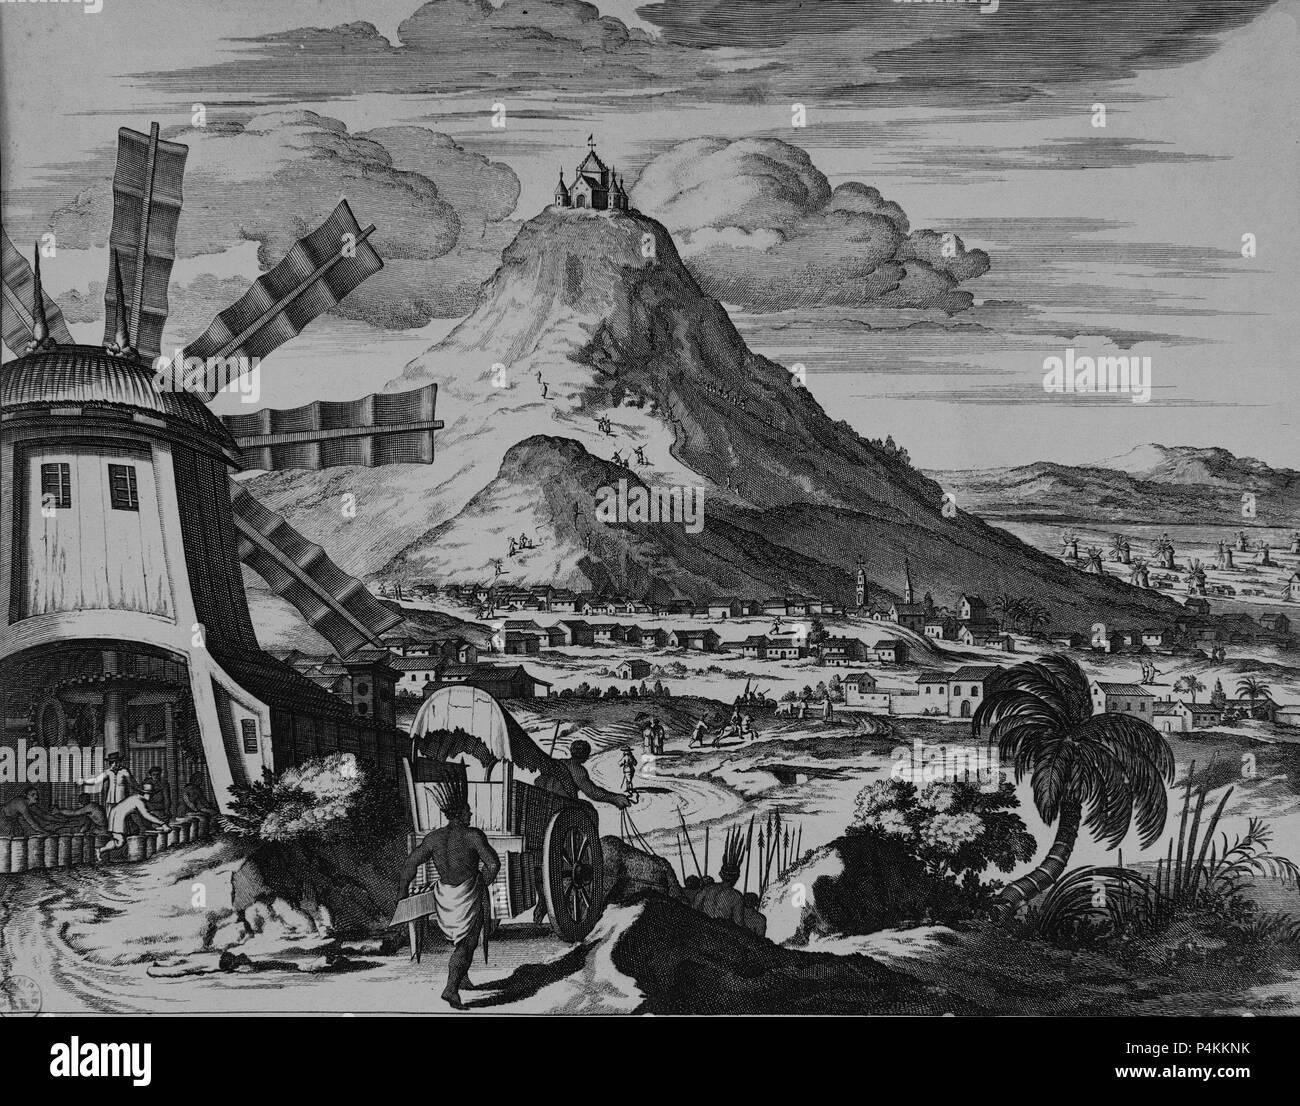 VISTA DE POTOSI - SIGLO XVII. Author: John Ogilby (1600-1676). Location: BIBLIOTECA NACIONAL-COLECCION, MADRID, SPAIN. - Stock Image